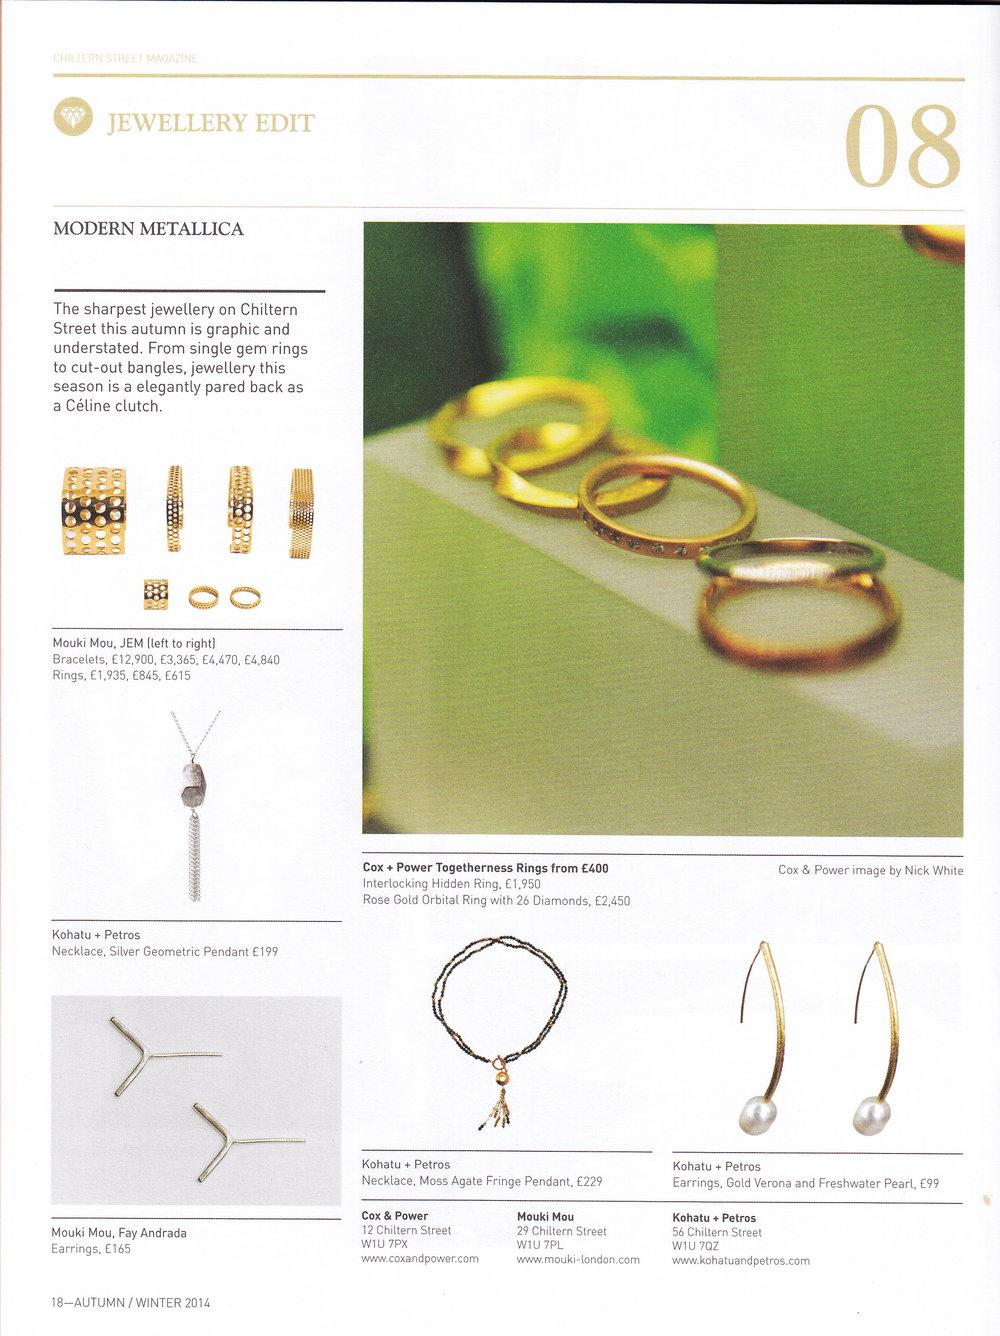 Jewellery Edit chiltern St Mag.jpg